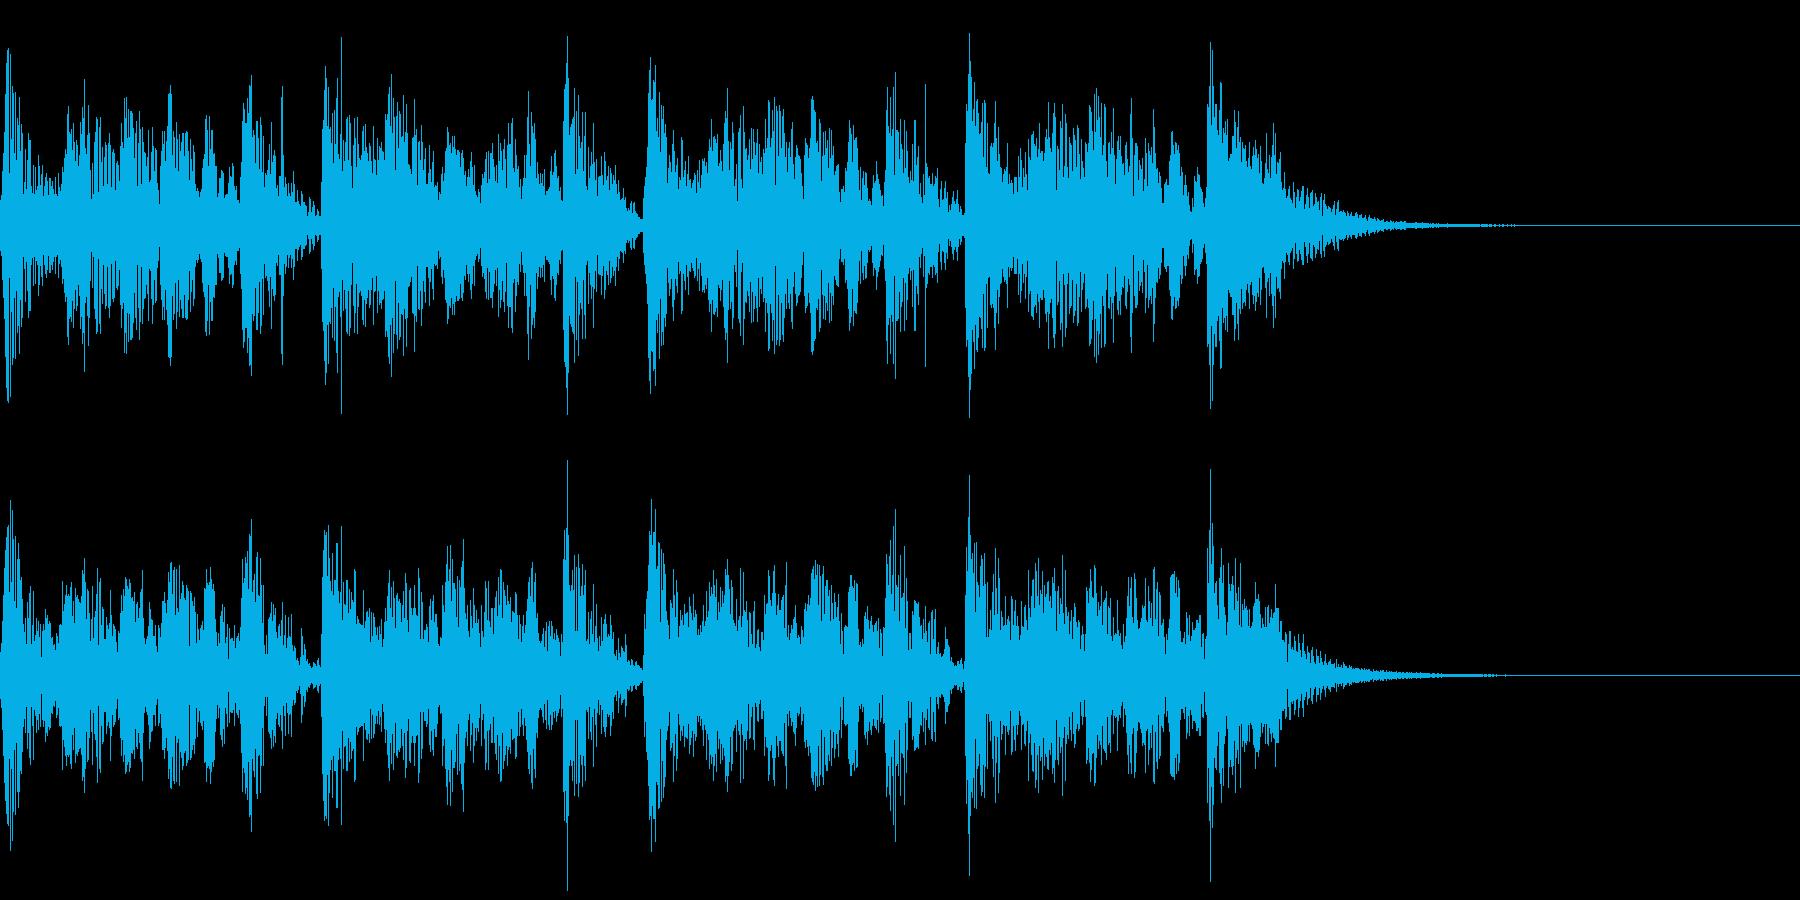 BEAT SHORTの再生済みの波形